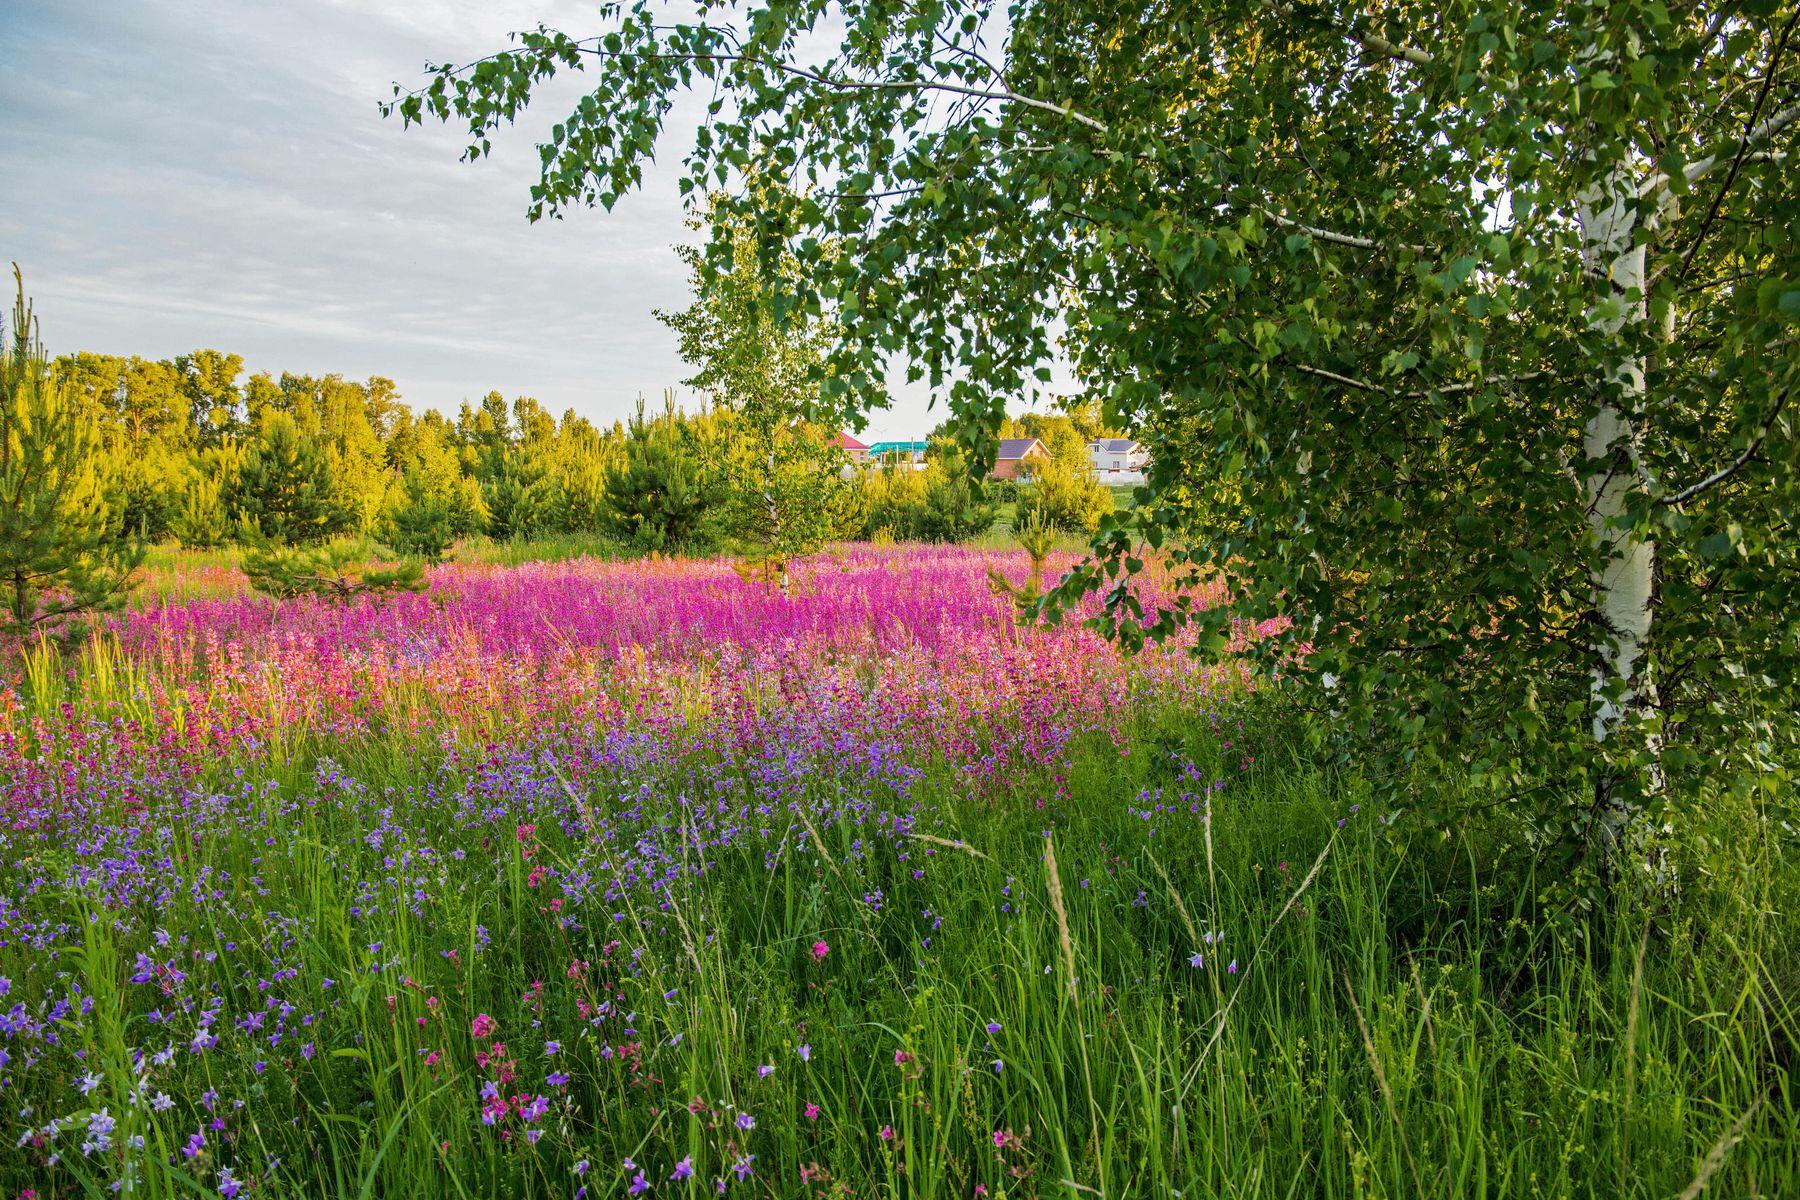 *** природа пейзаж лето вечер татарстан дубровка гвоздика смолка